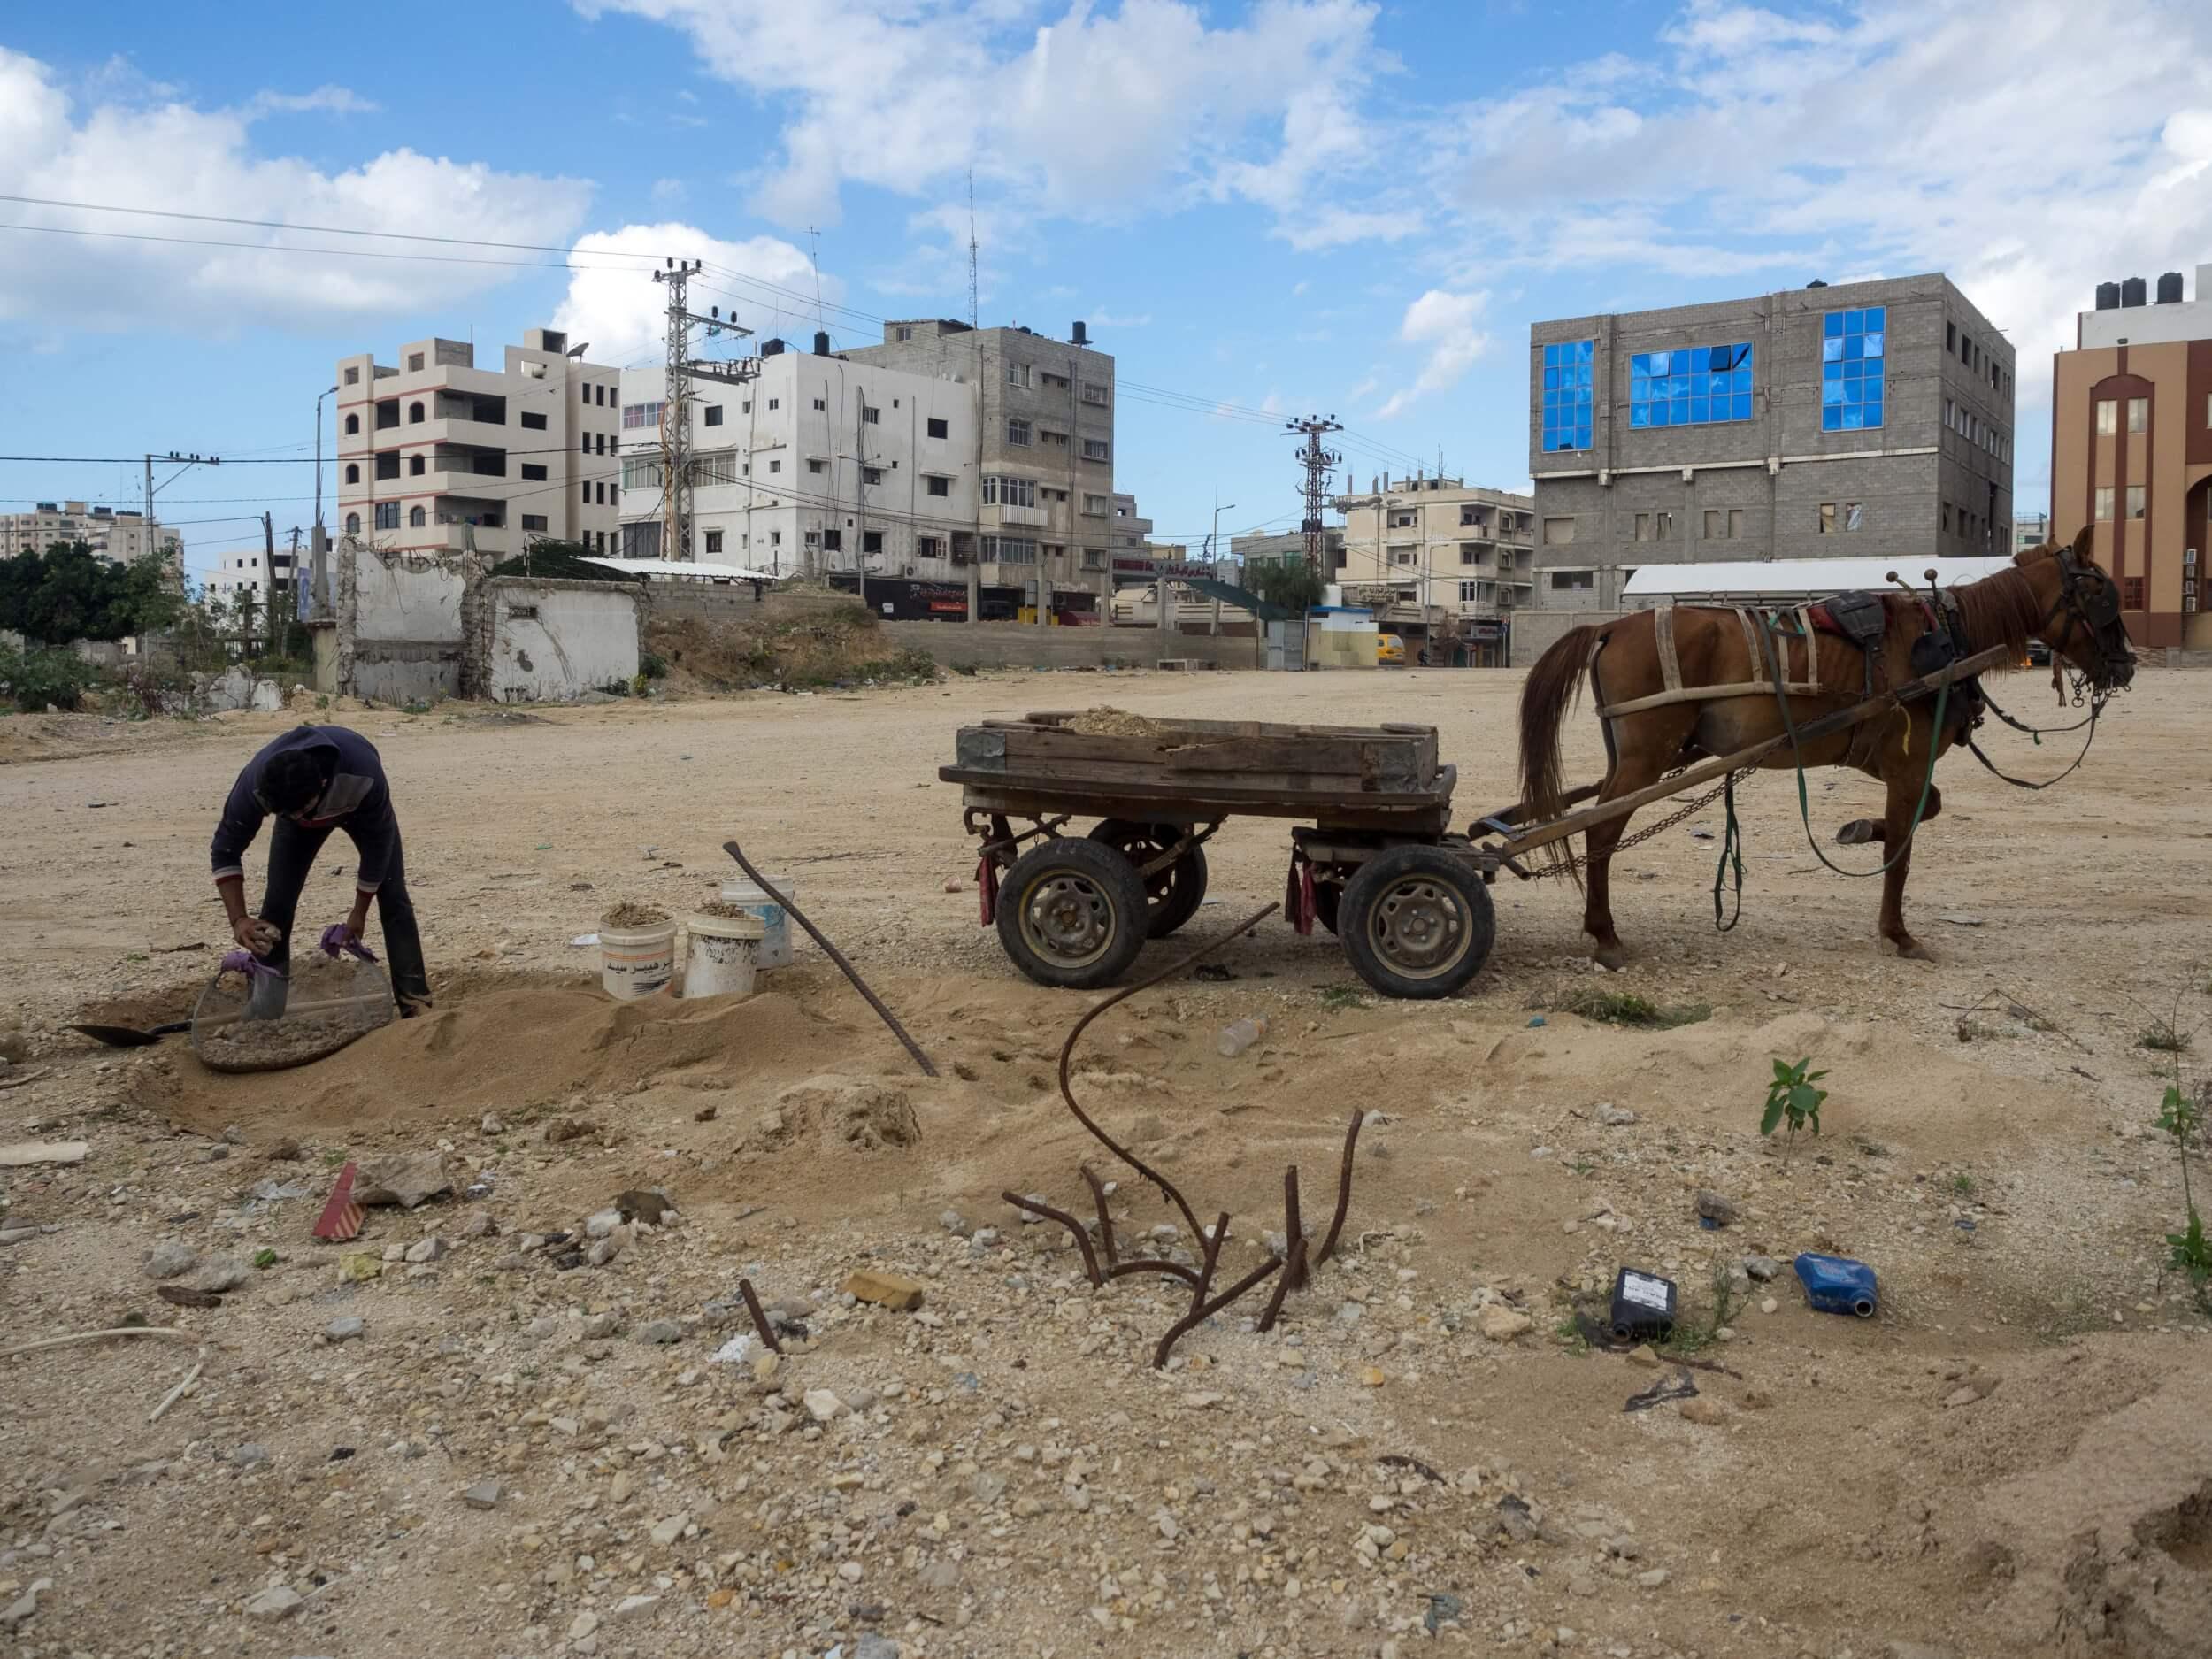 Mohammed Majd Hosni Al-Madhoun, 23, collects rocks in a lot in Gaza City. (Photo: Dan Cohen)